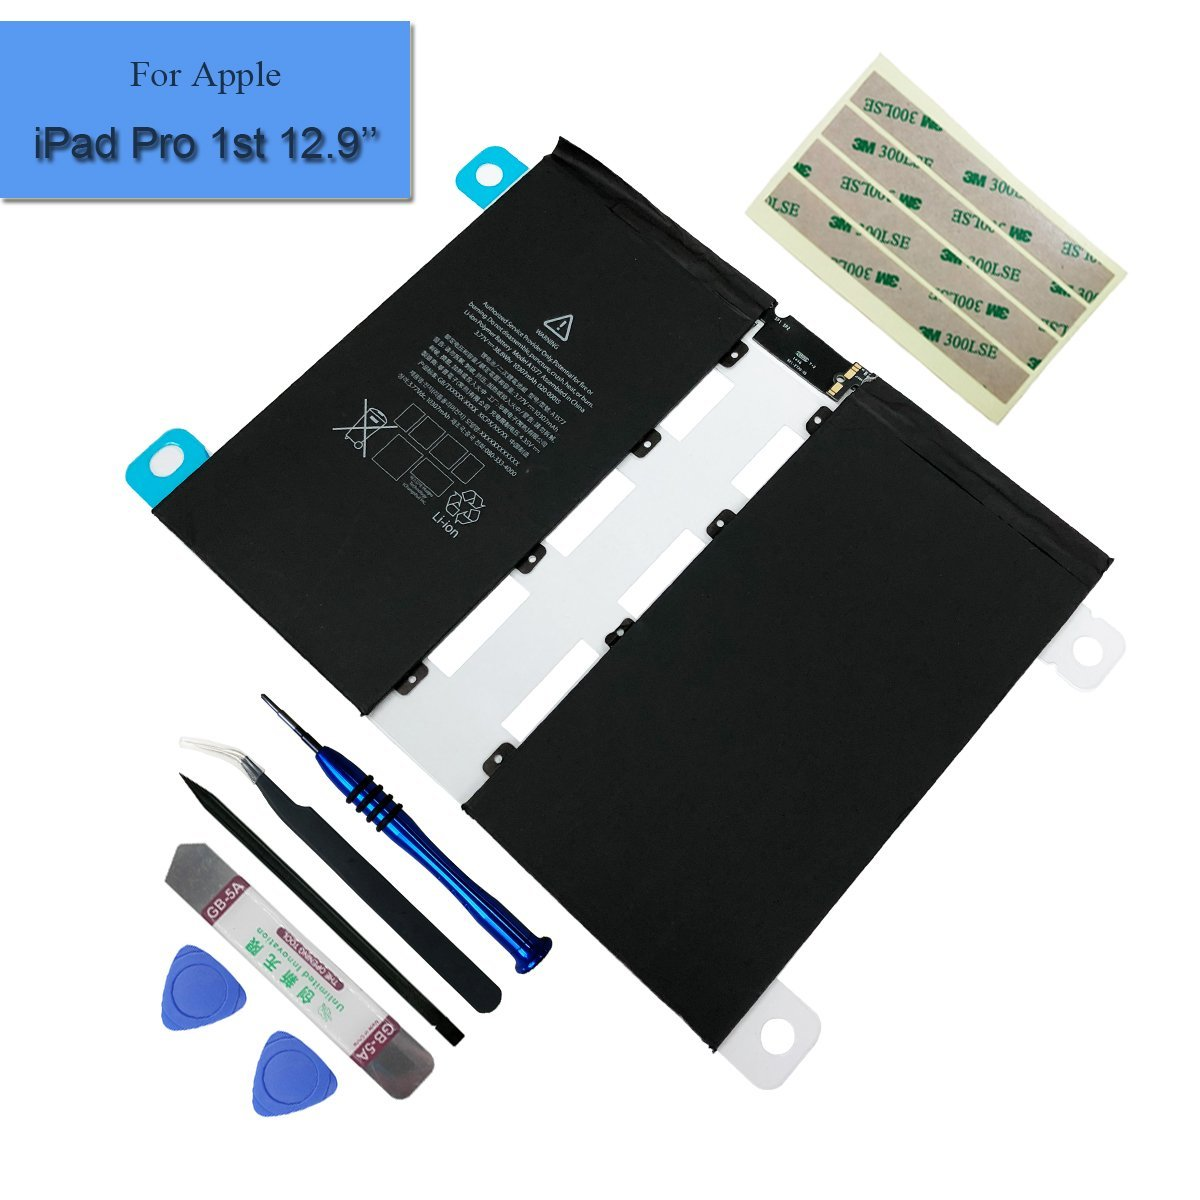 Bateria Tablet para Apple iPad Pro 12.9'' 1st 10307mAh 38.8W